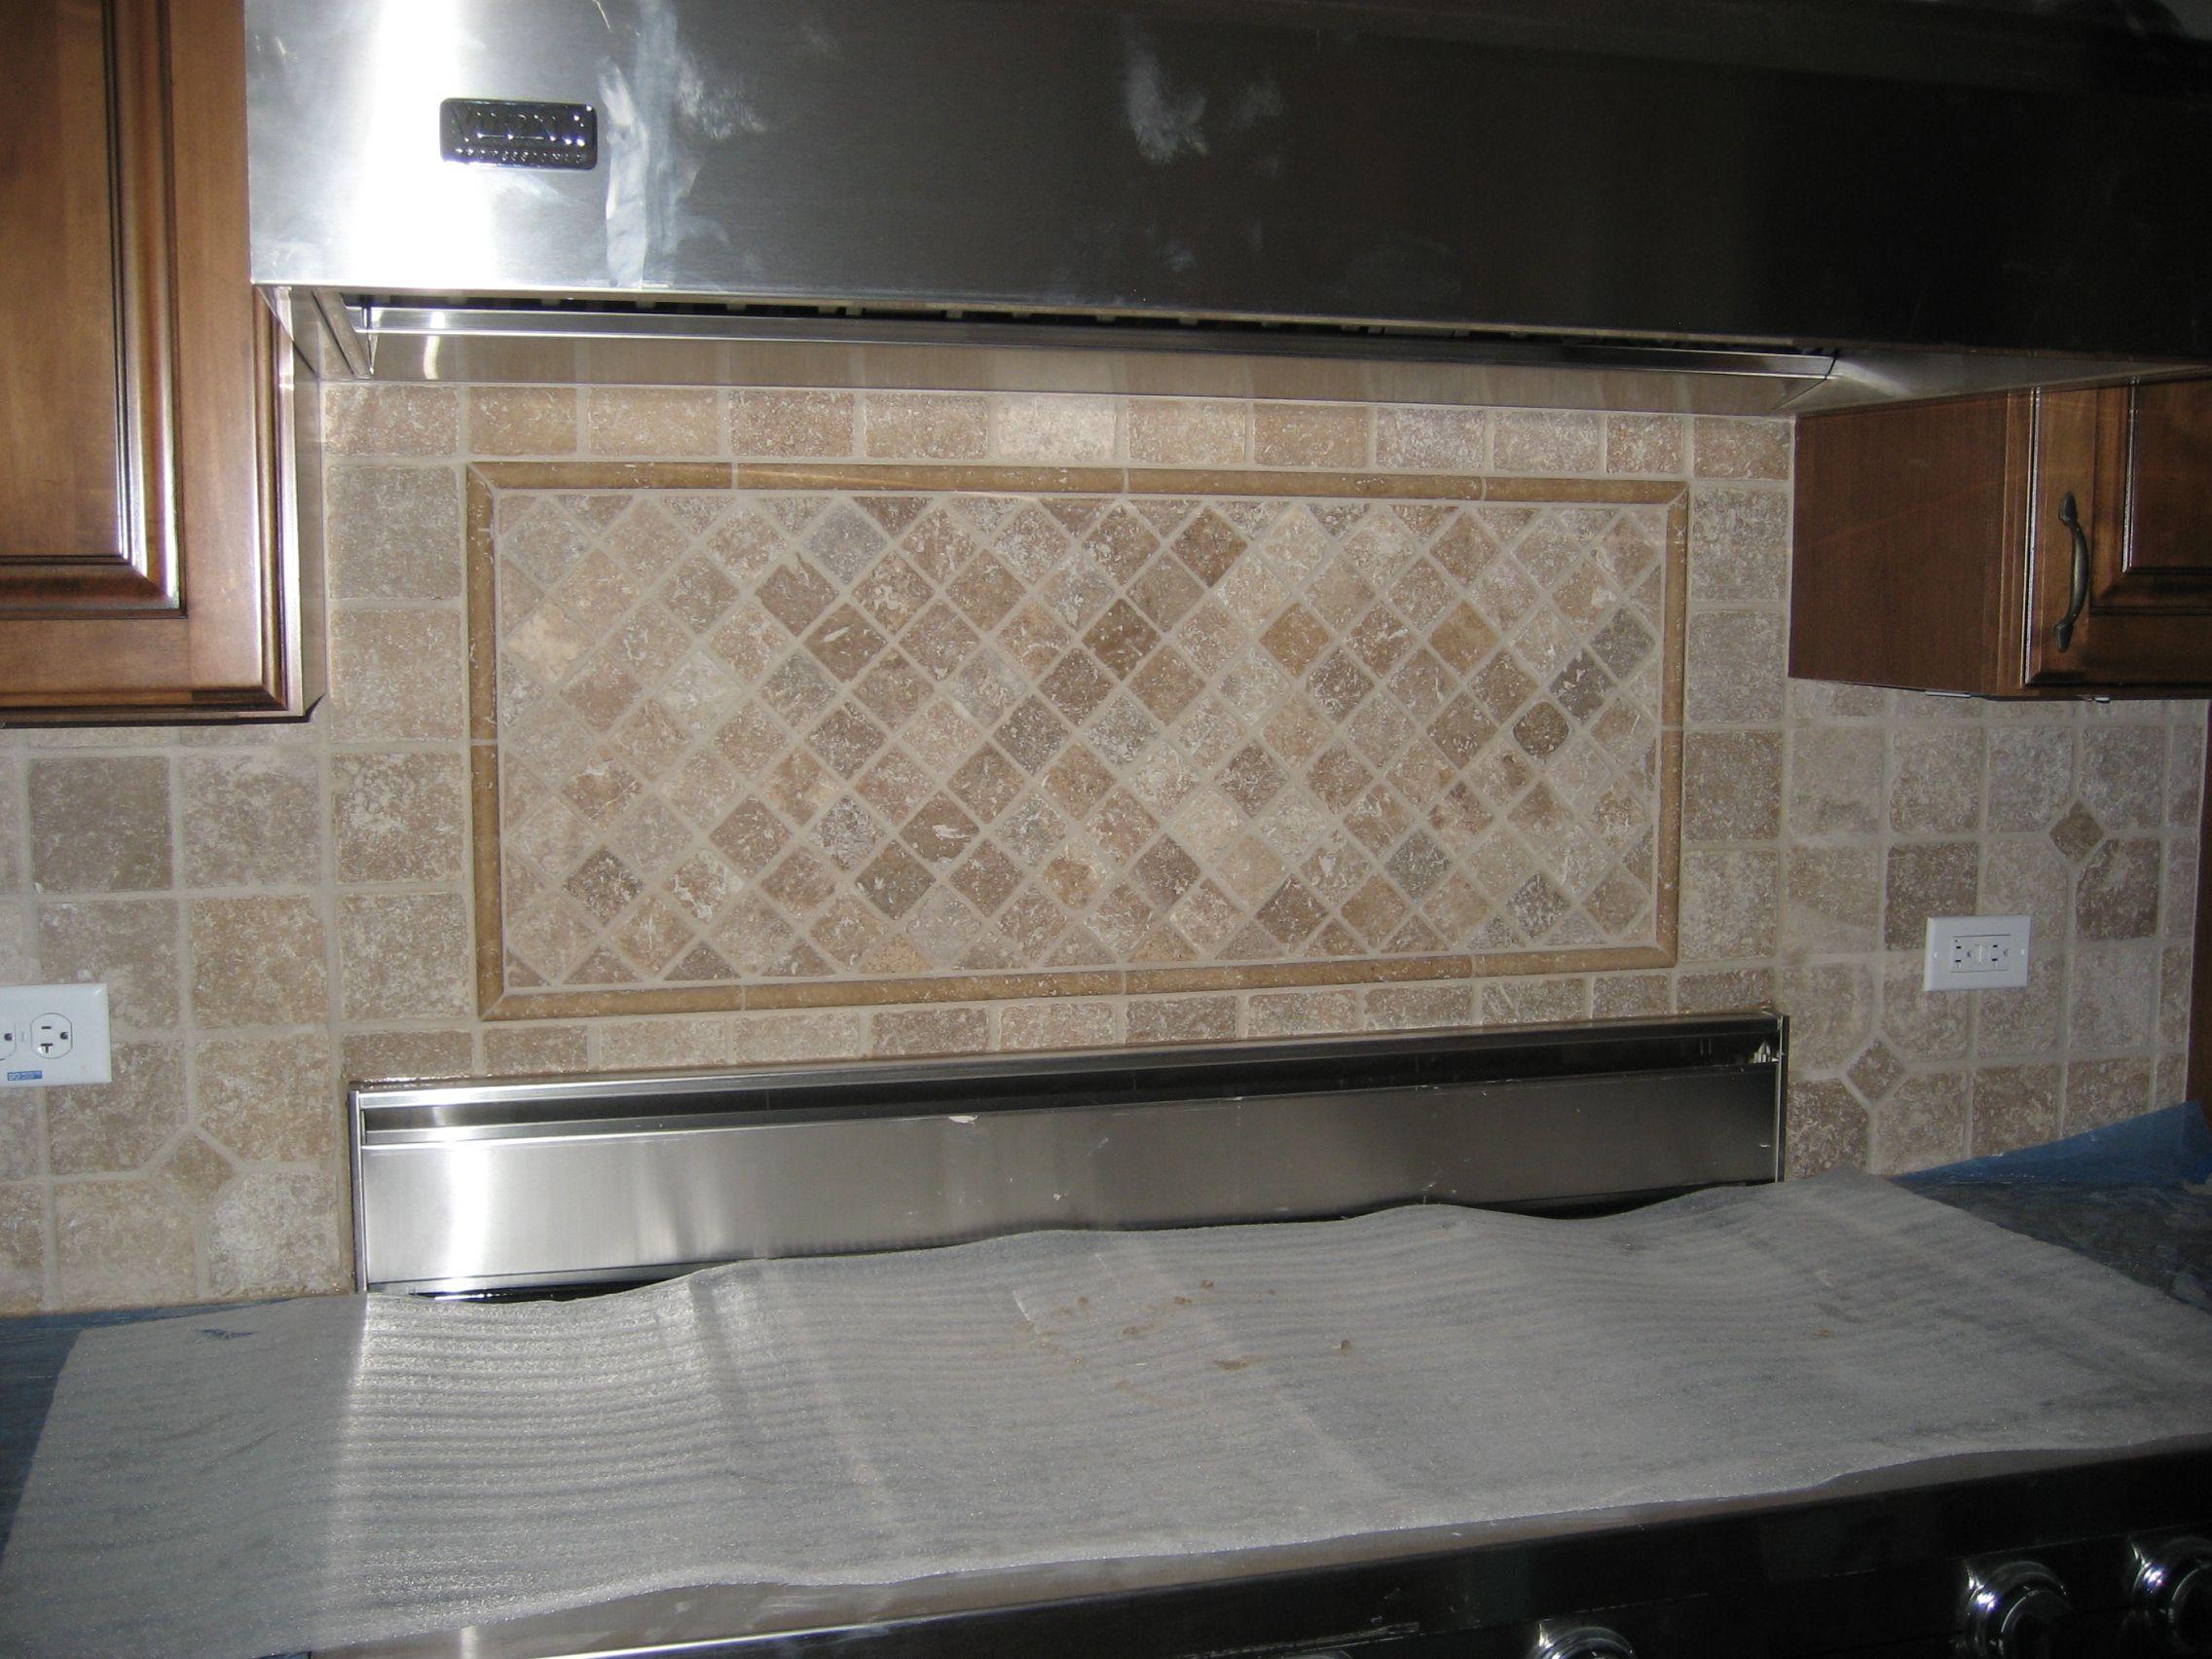 - Custom Tile Backsplash Inlay Behind Range. Custom Tile